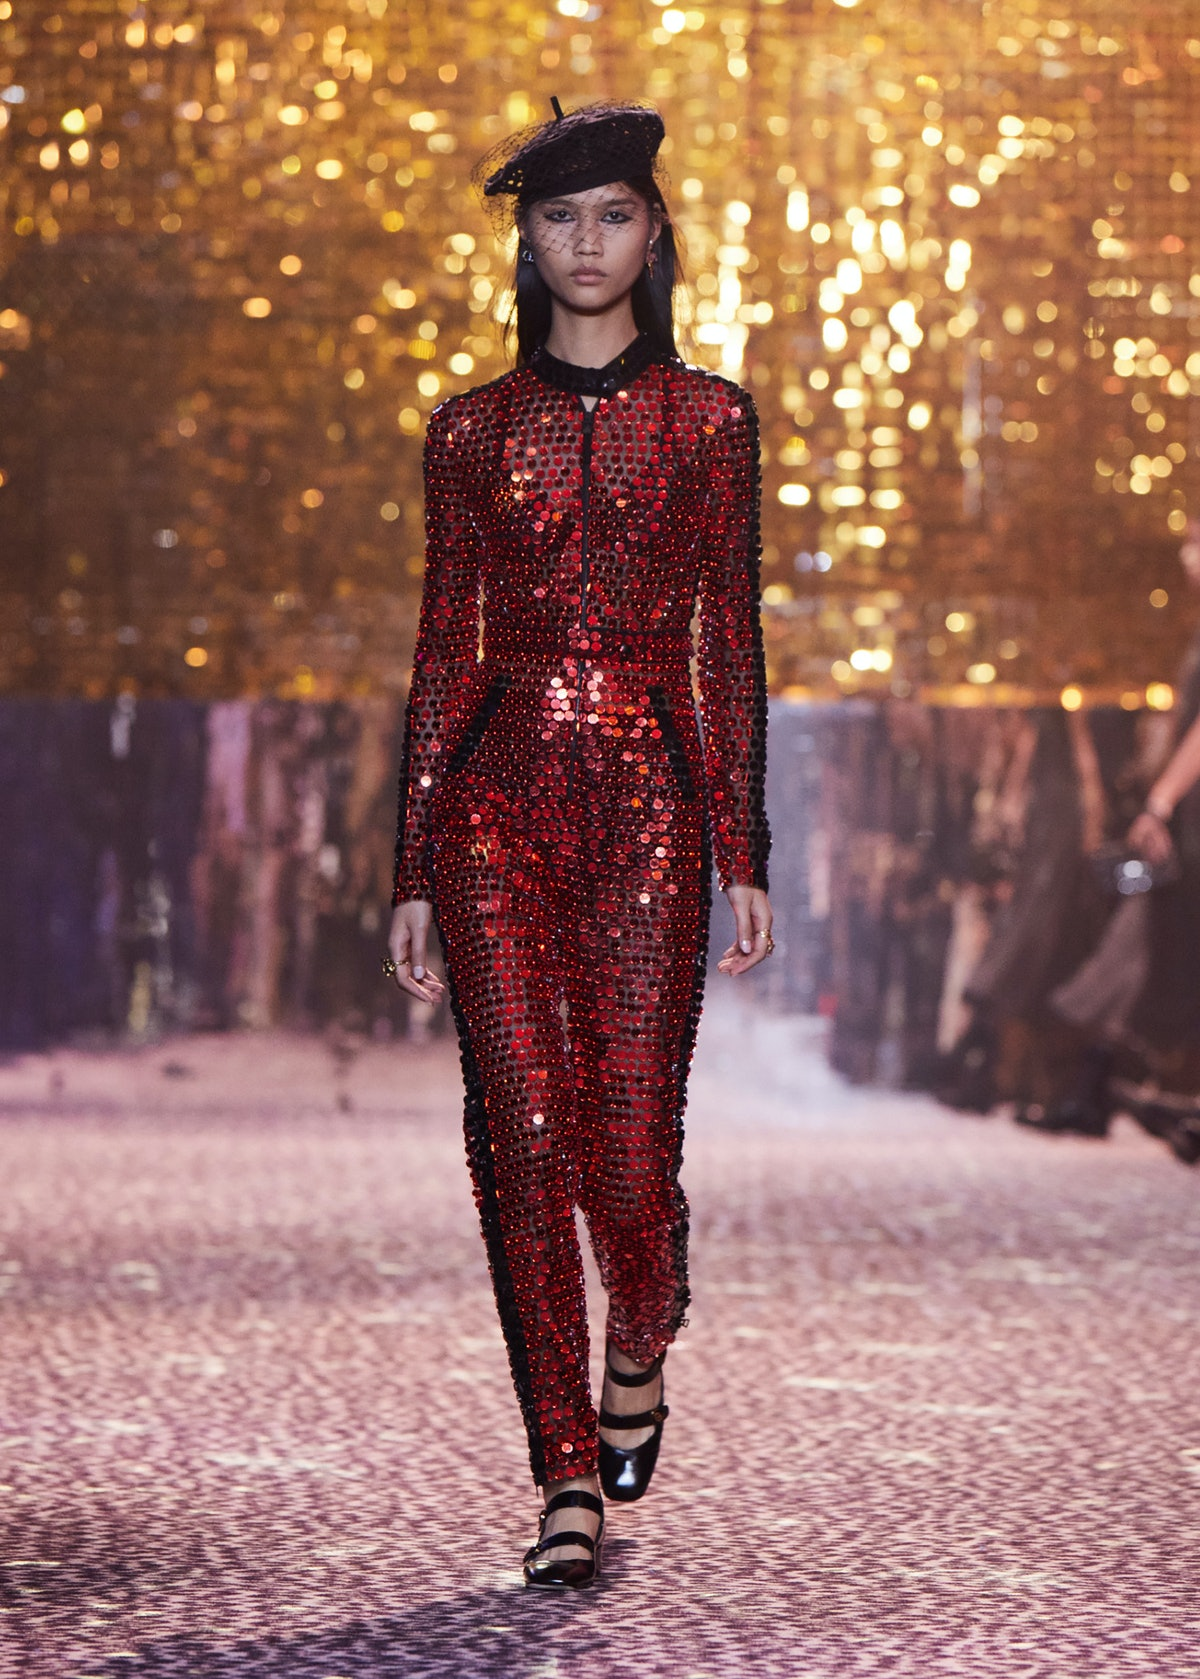 Model in red sequined bodysuit